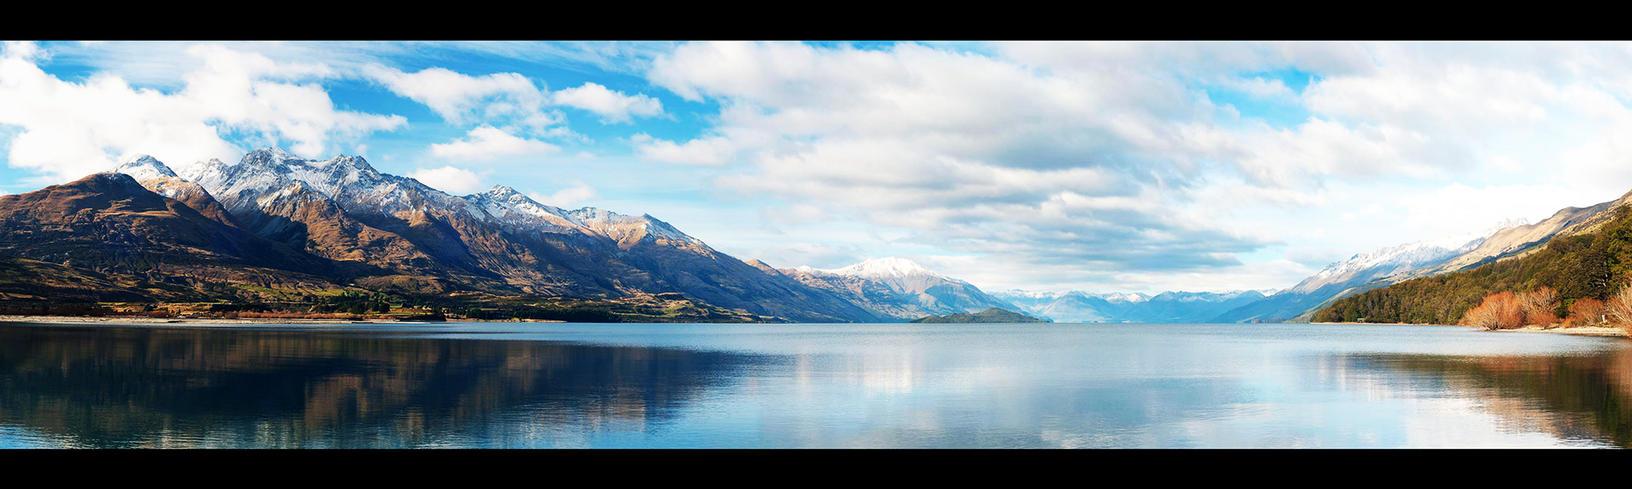 Lake Wakatipu, New Zealand. by pmd1138